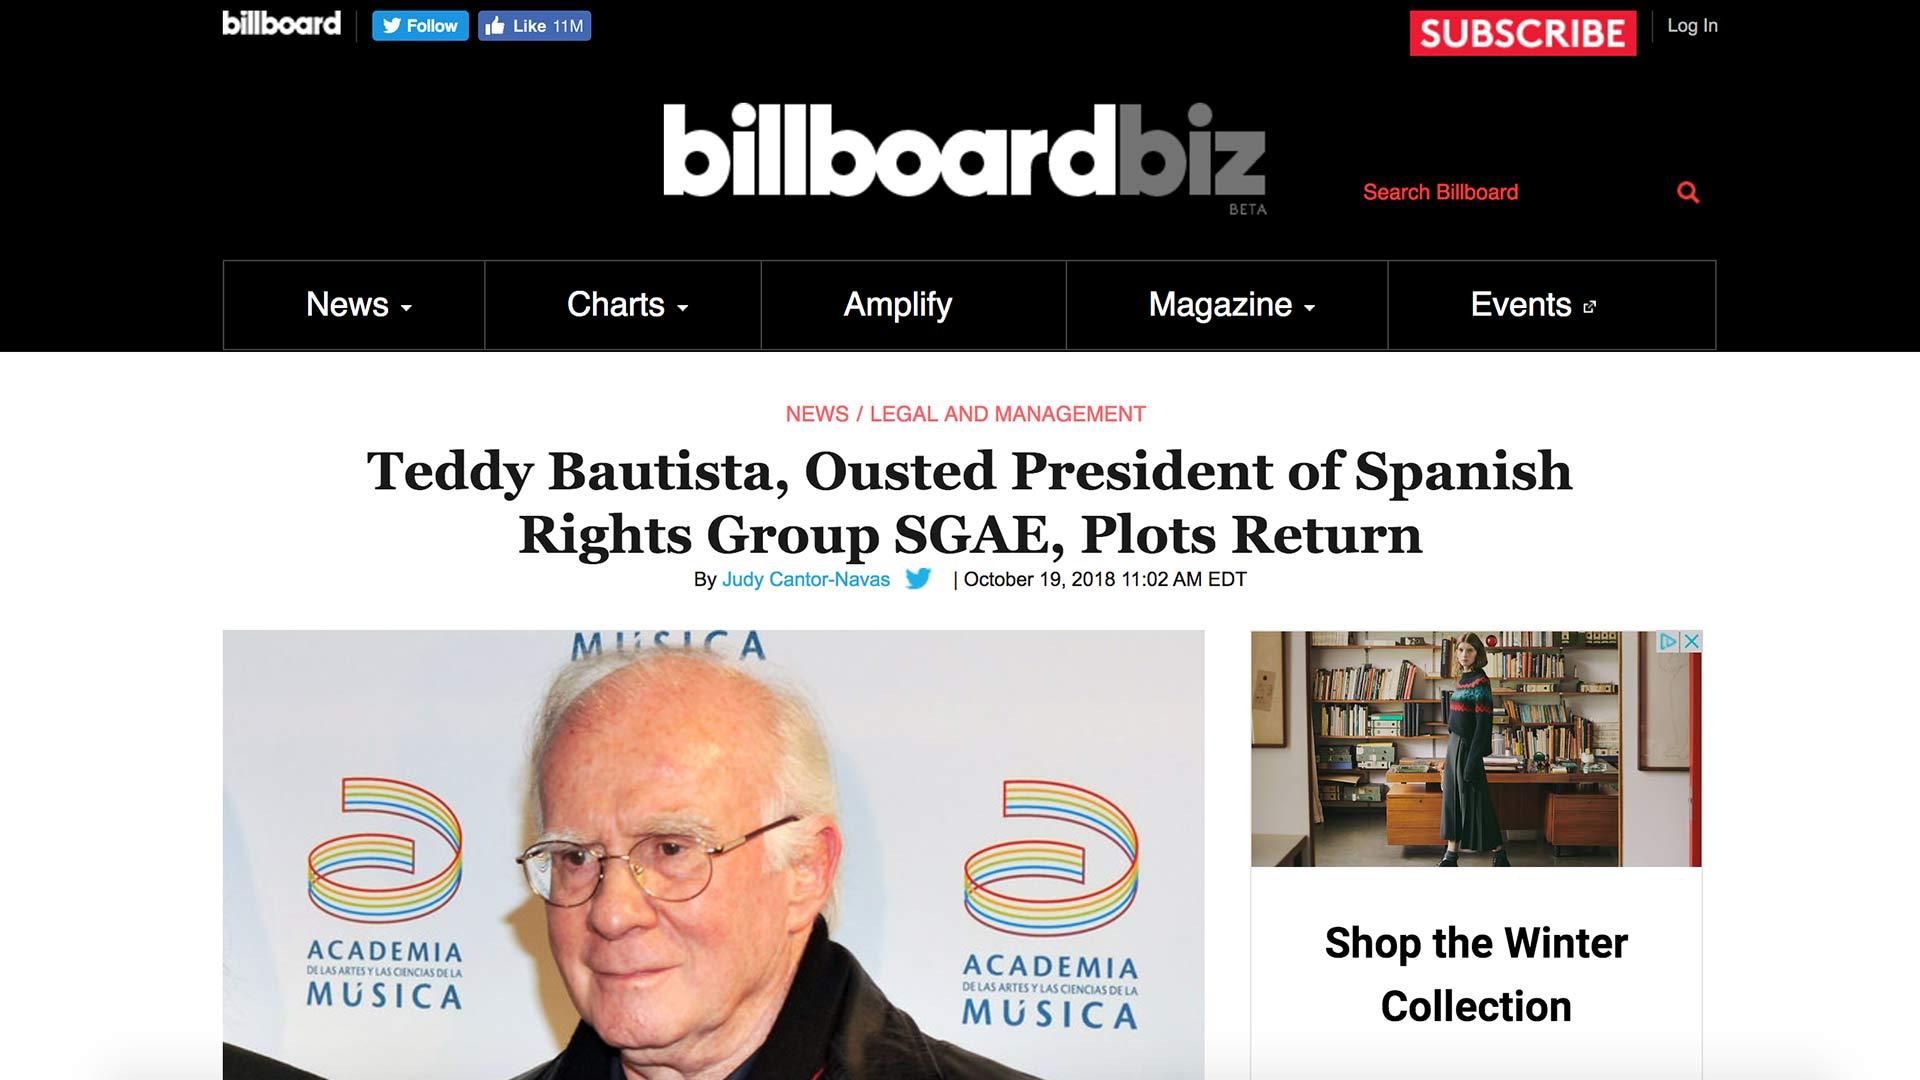 Fairness Rocks News Teddy Bautista, Ousted President of Spanish Rights Group SGAE, Plots Return